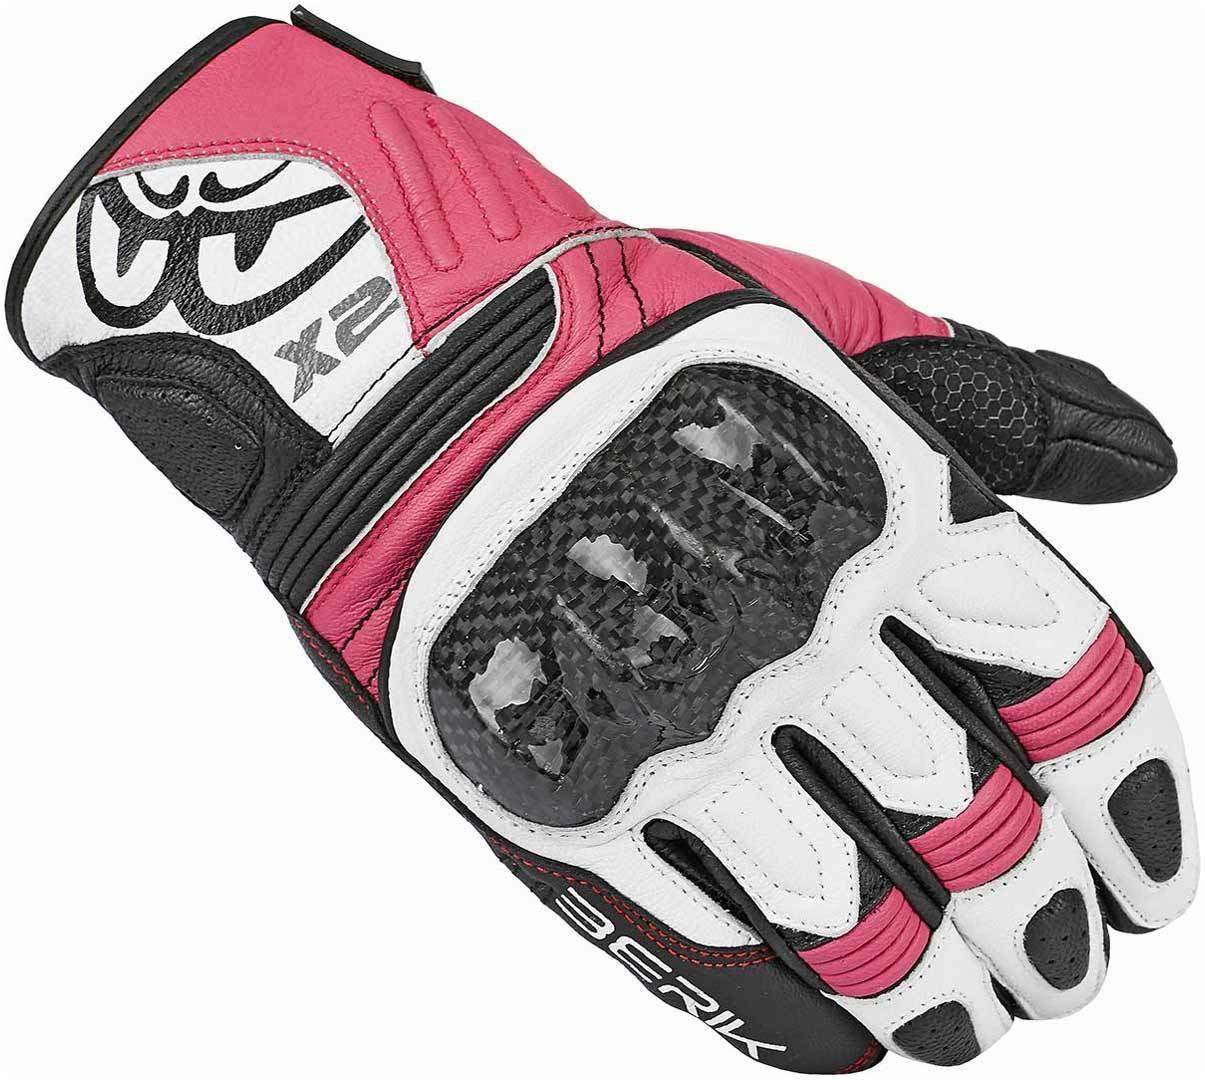 Berik LDX Damen Handschuhe, schwarz-pink, Größe L, schwarz-pink, Größe L